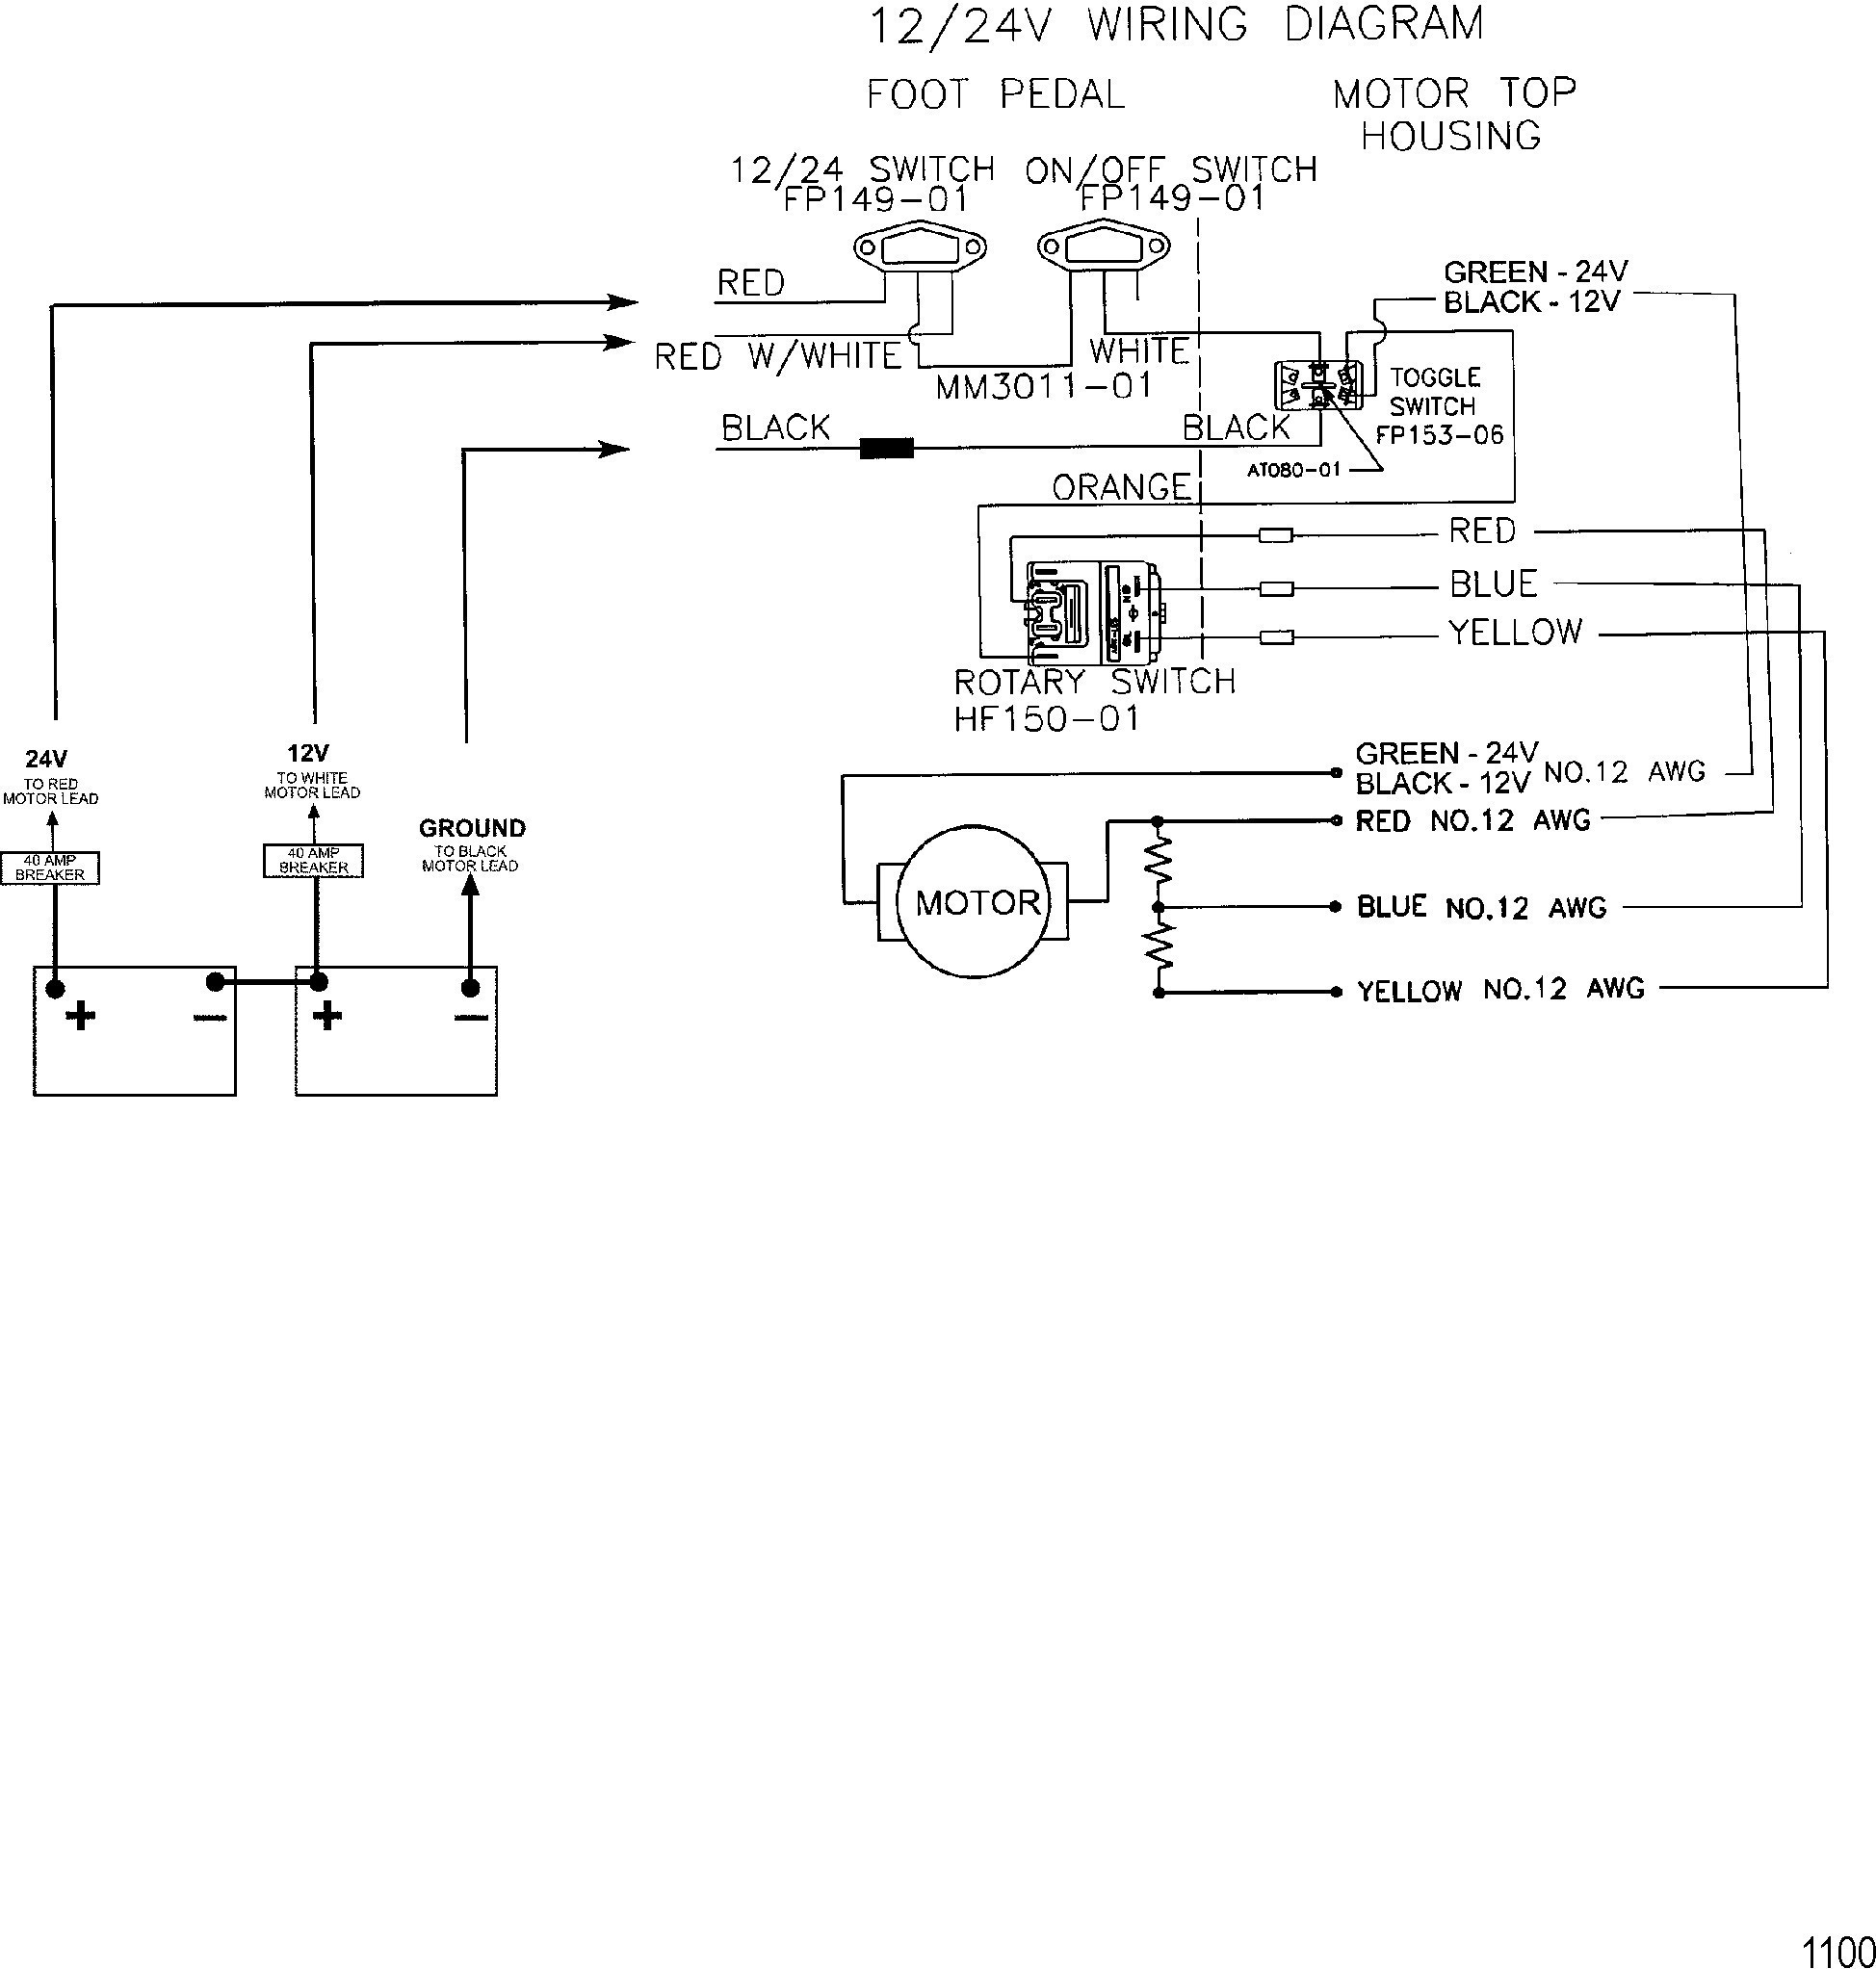 36 Volt Trolling Motor Wiring Diagram | Wiring Diagram - 12 24 Volt Trolling Motor Wiring Diagram